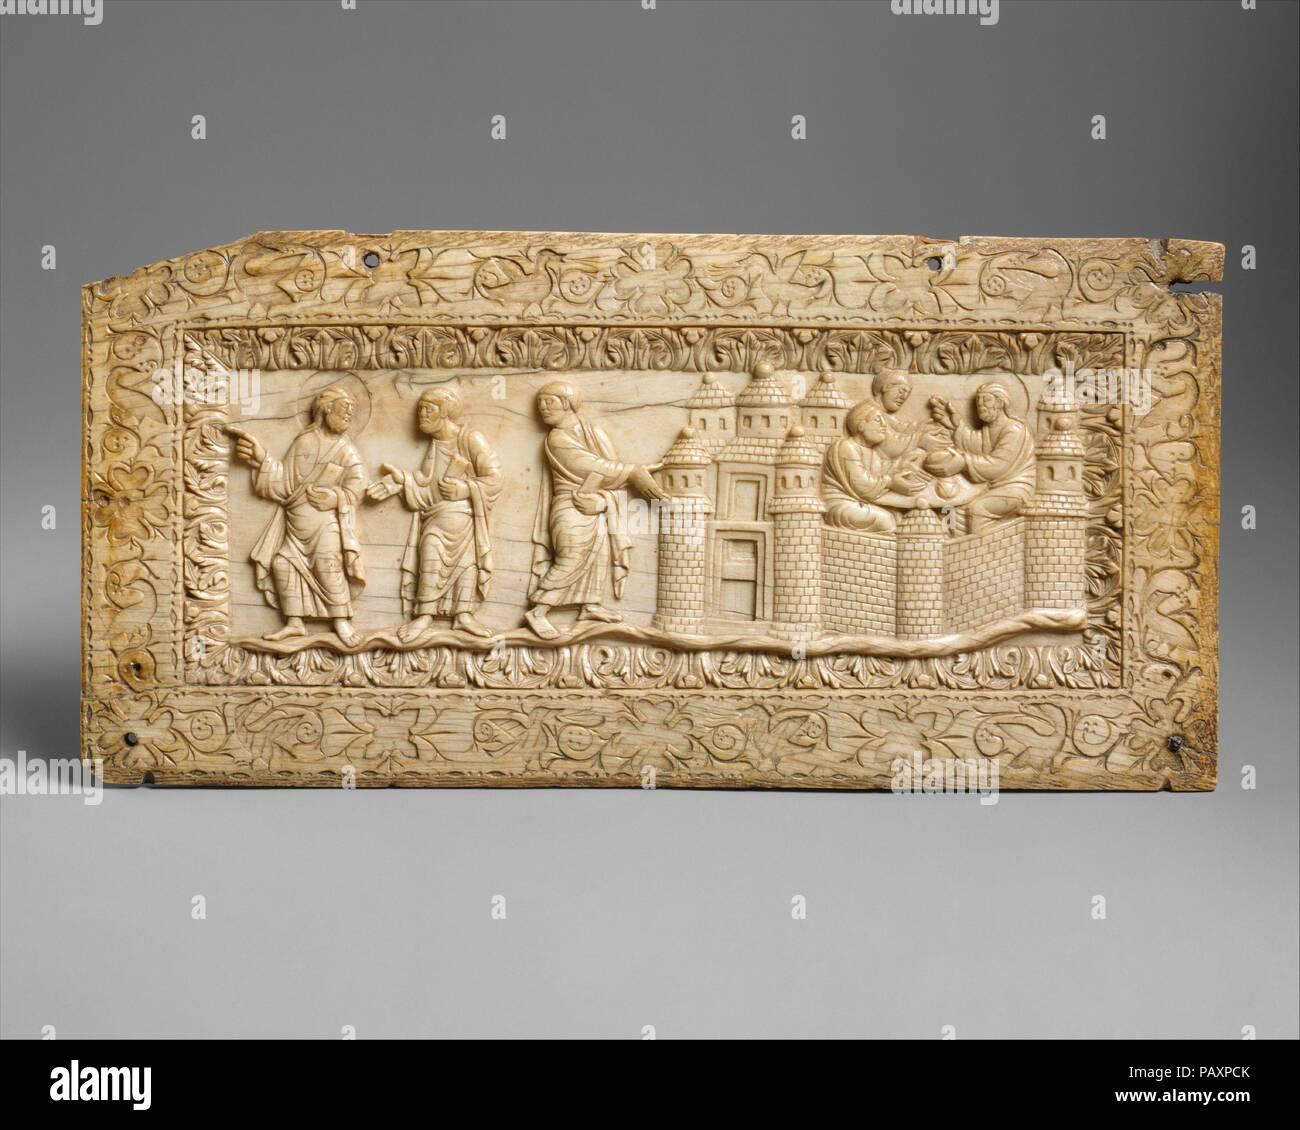 Plaque with Scenes at Emmaus  Culture: Carolingian  Dimensions